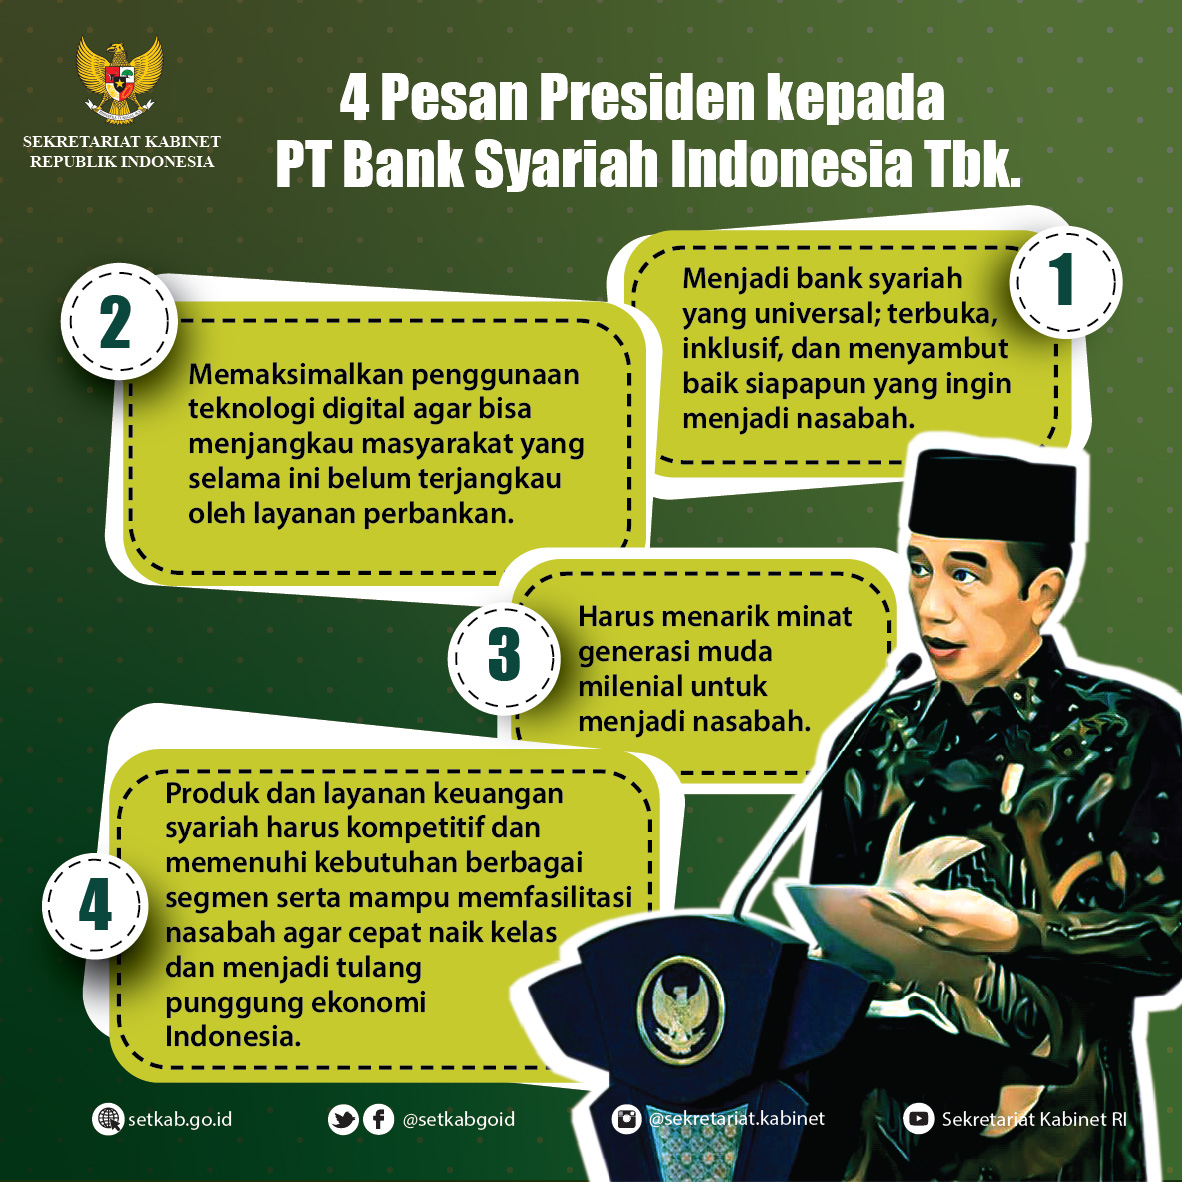 Arahan Presiden RI pada Peresmian PT. Bank Syariah Indonesia Tbk, Senin (01/02/2021)